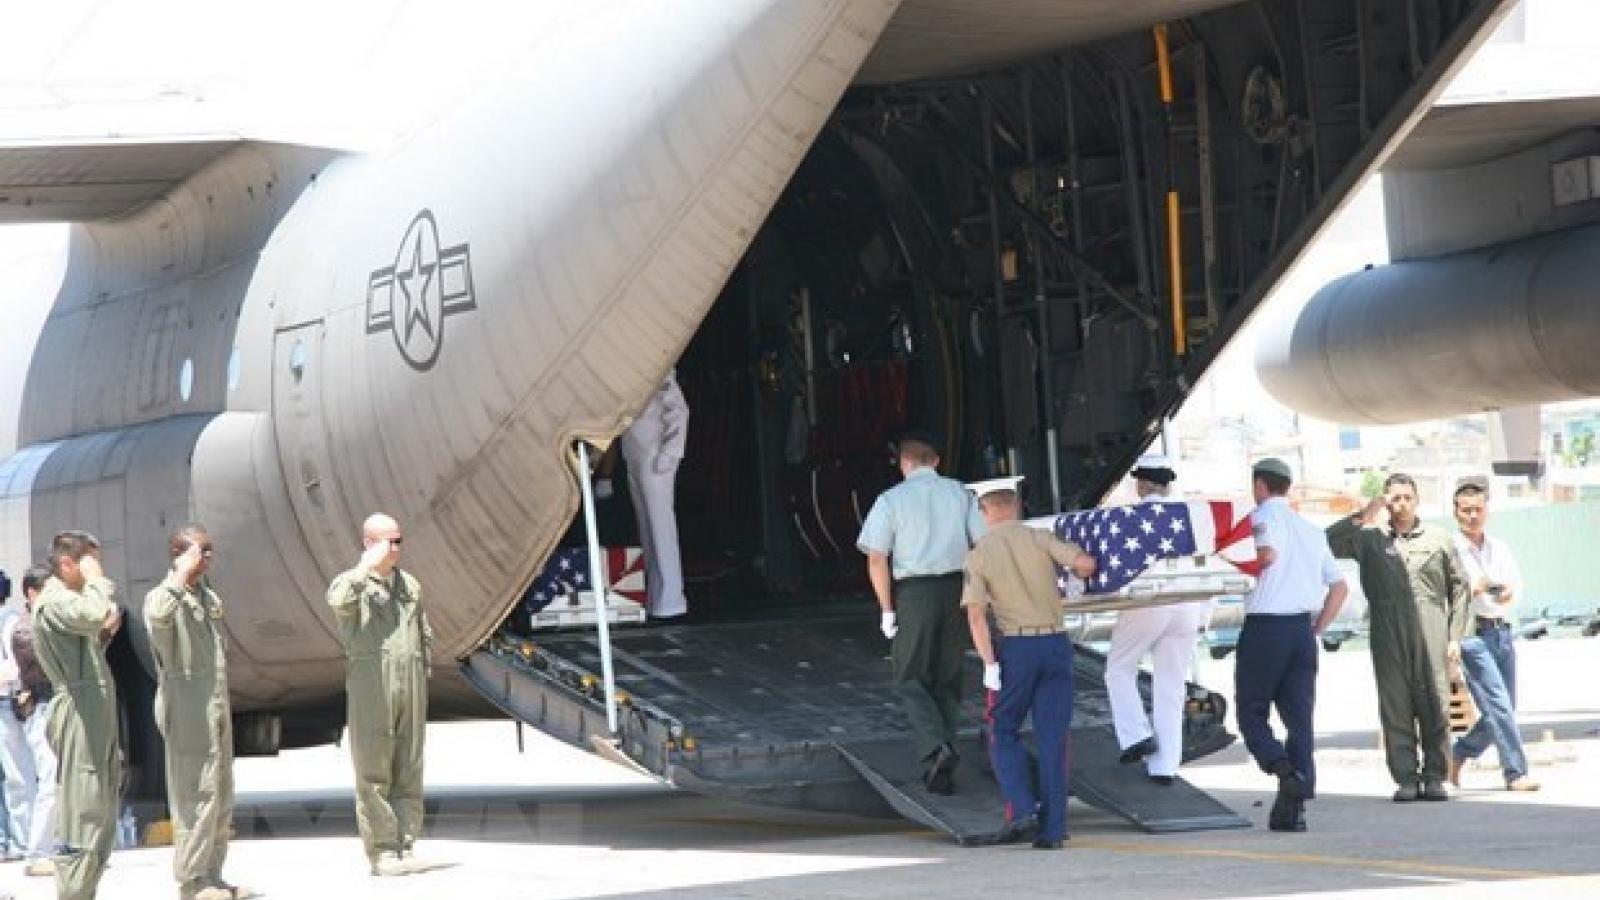 Remains of US servicemen repatriated